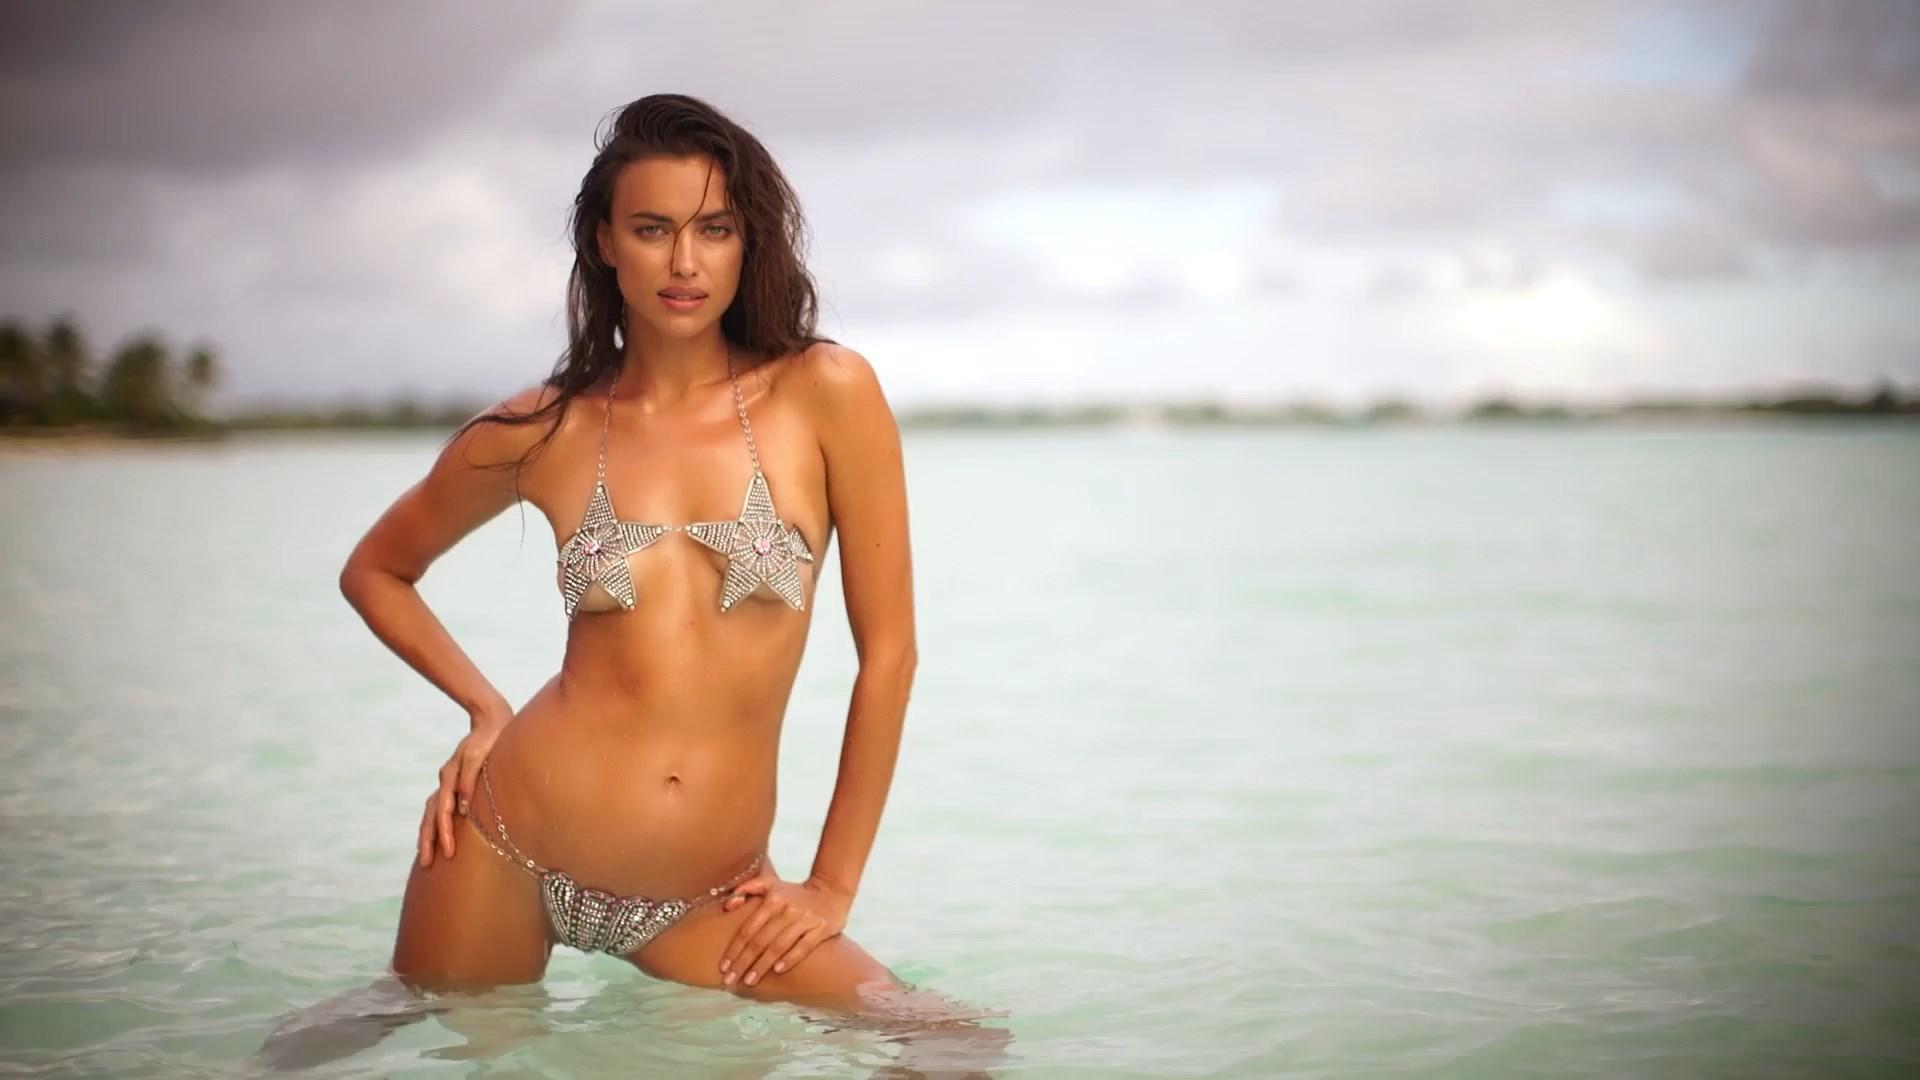 nude pics of Irina Shayk